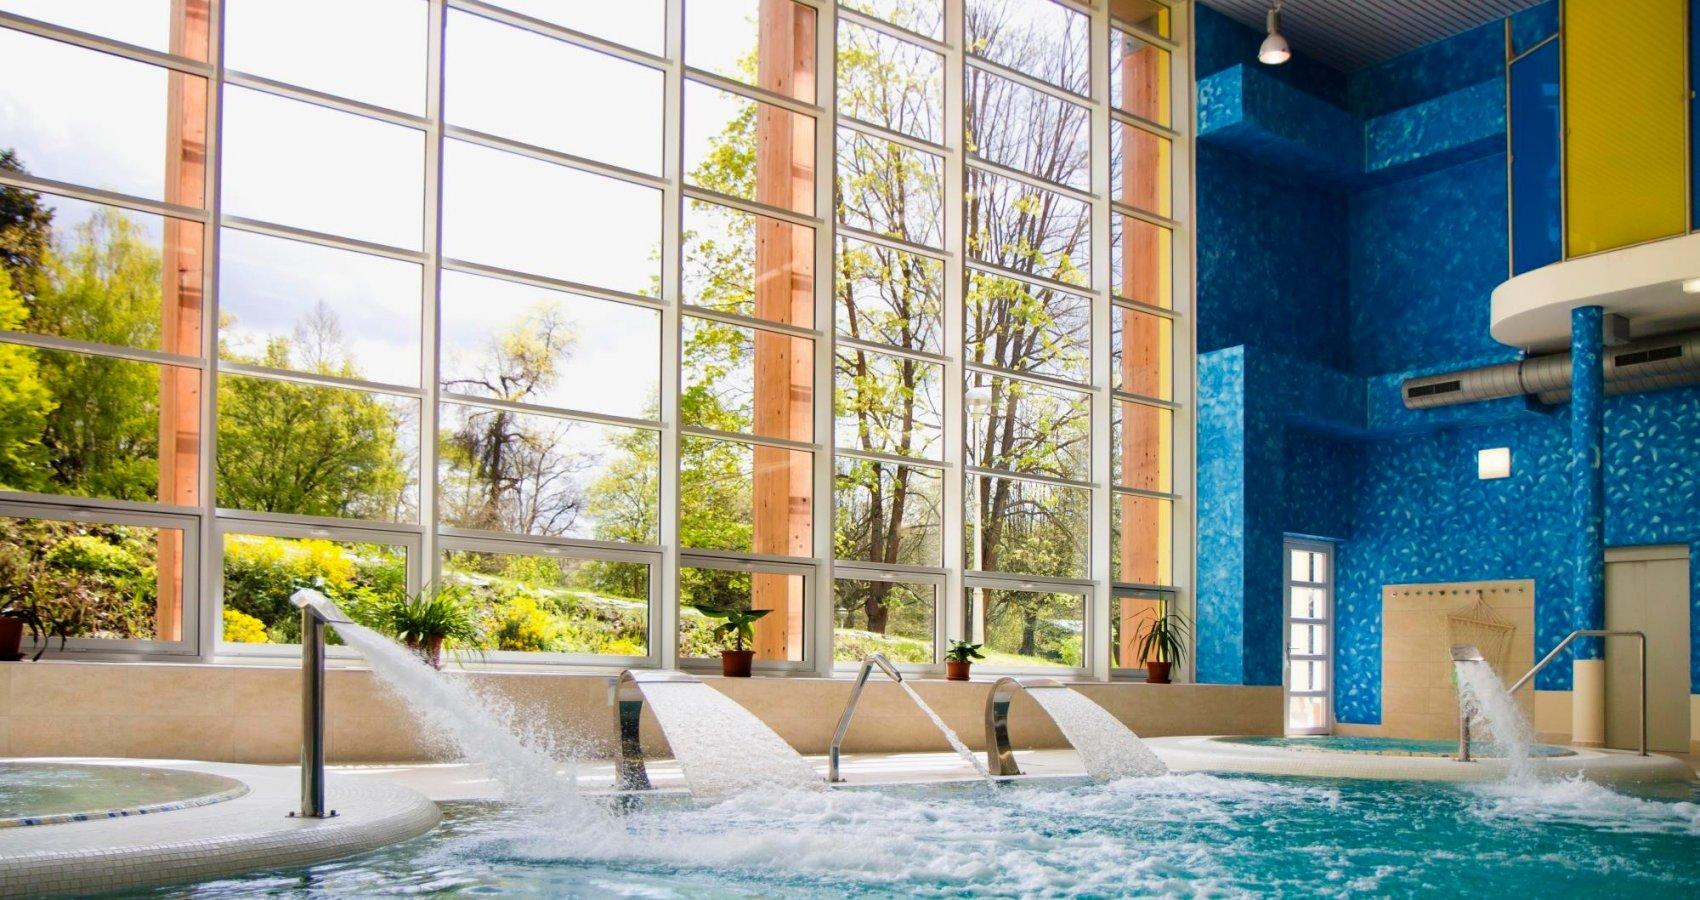 Bazén s protiproudy ve Wellnesscentru